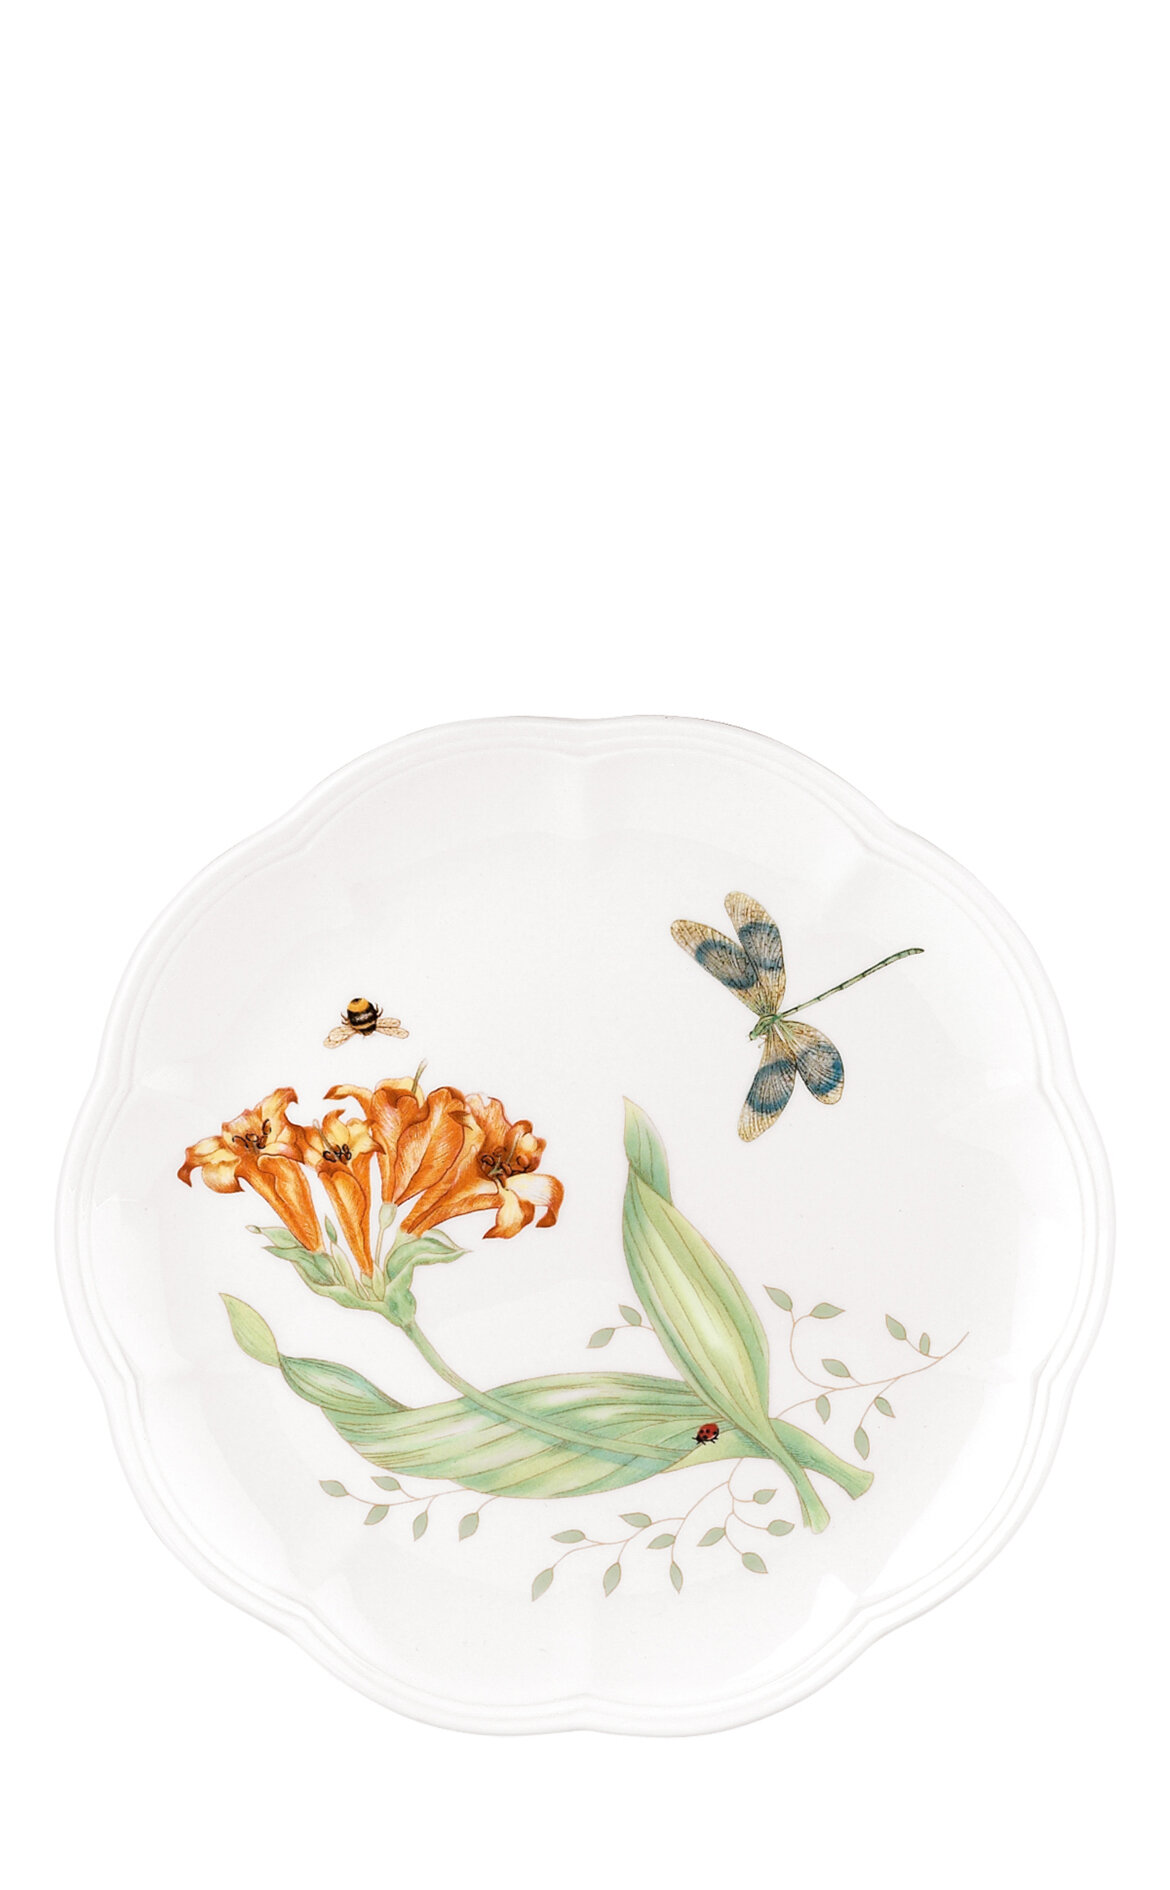 Lenox-Lenox Butterfly Pasta Tabağı, Drangonfly, 23Cm